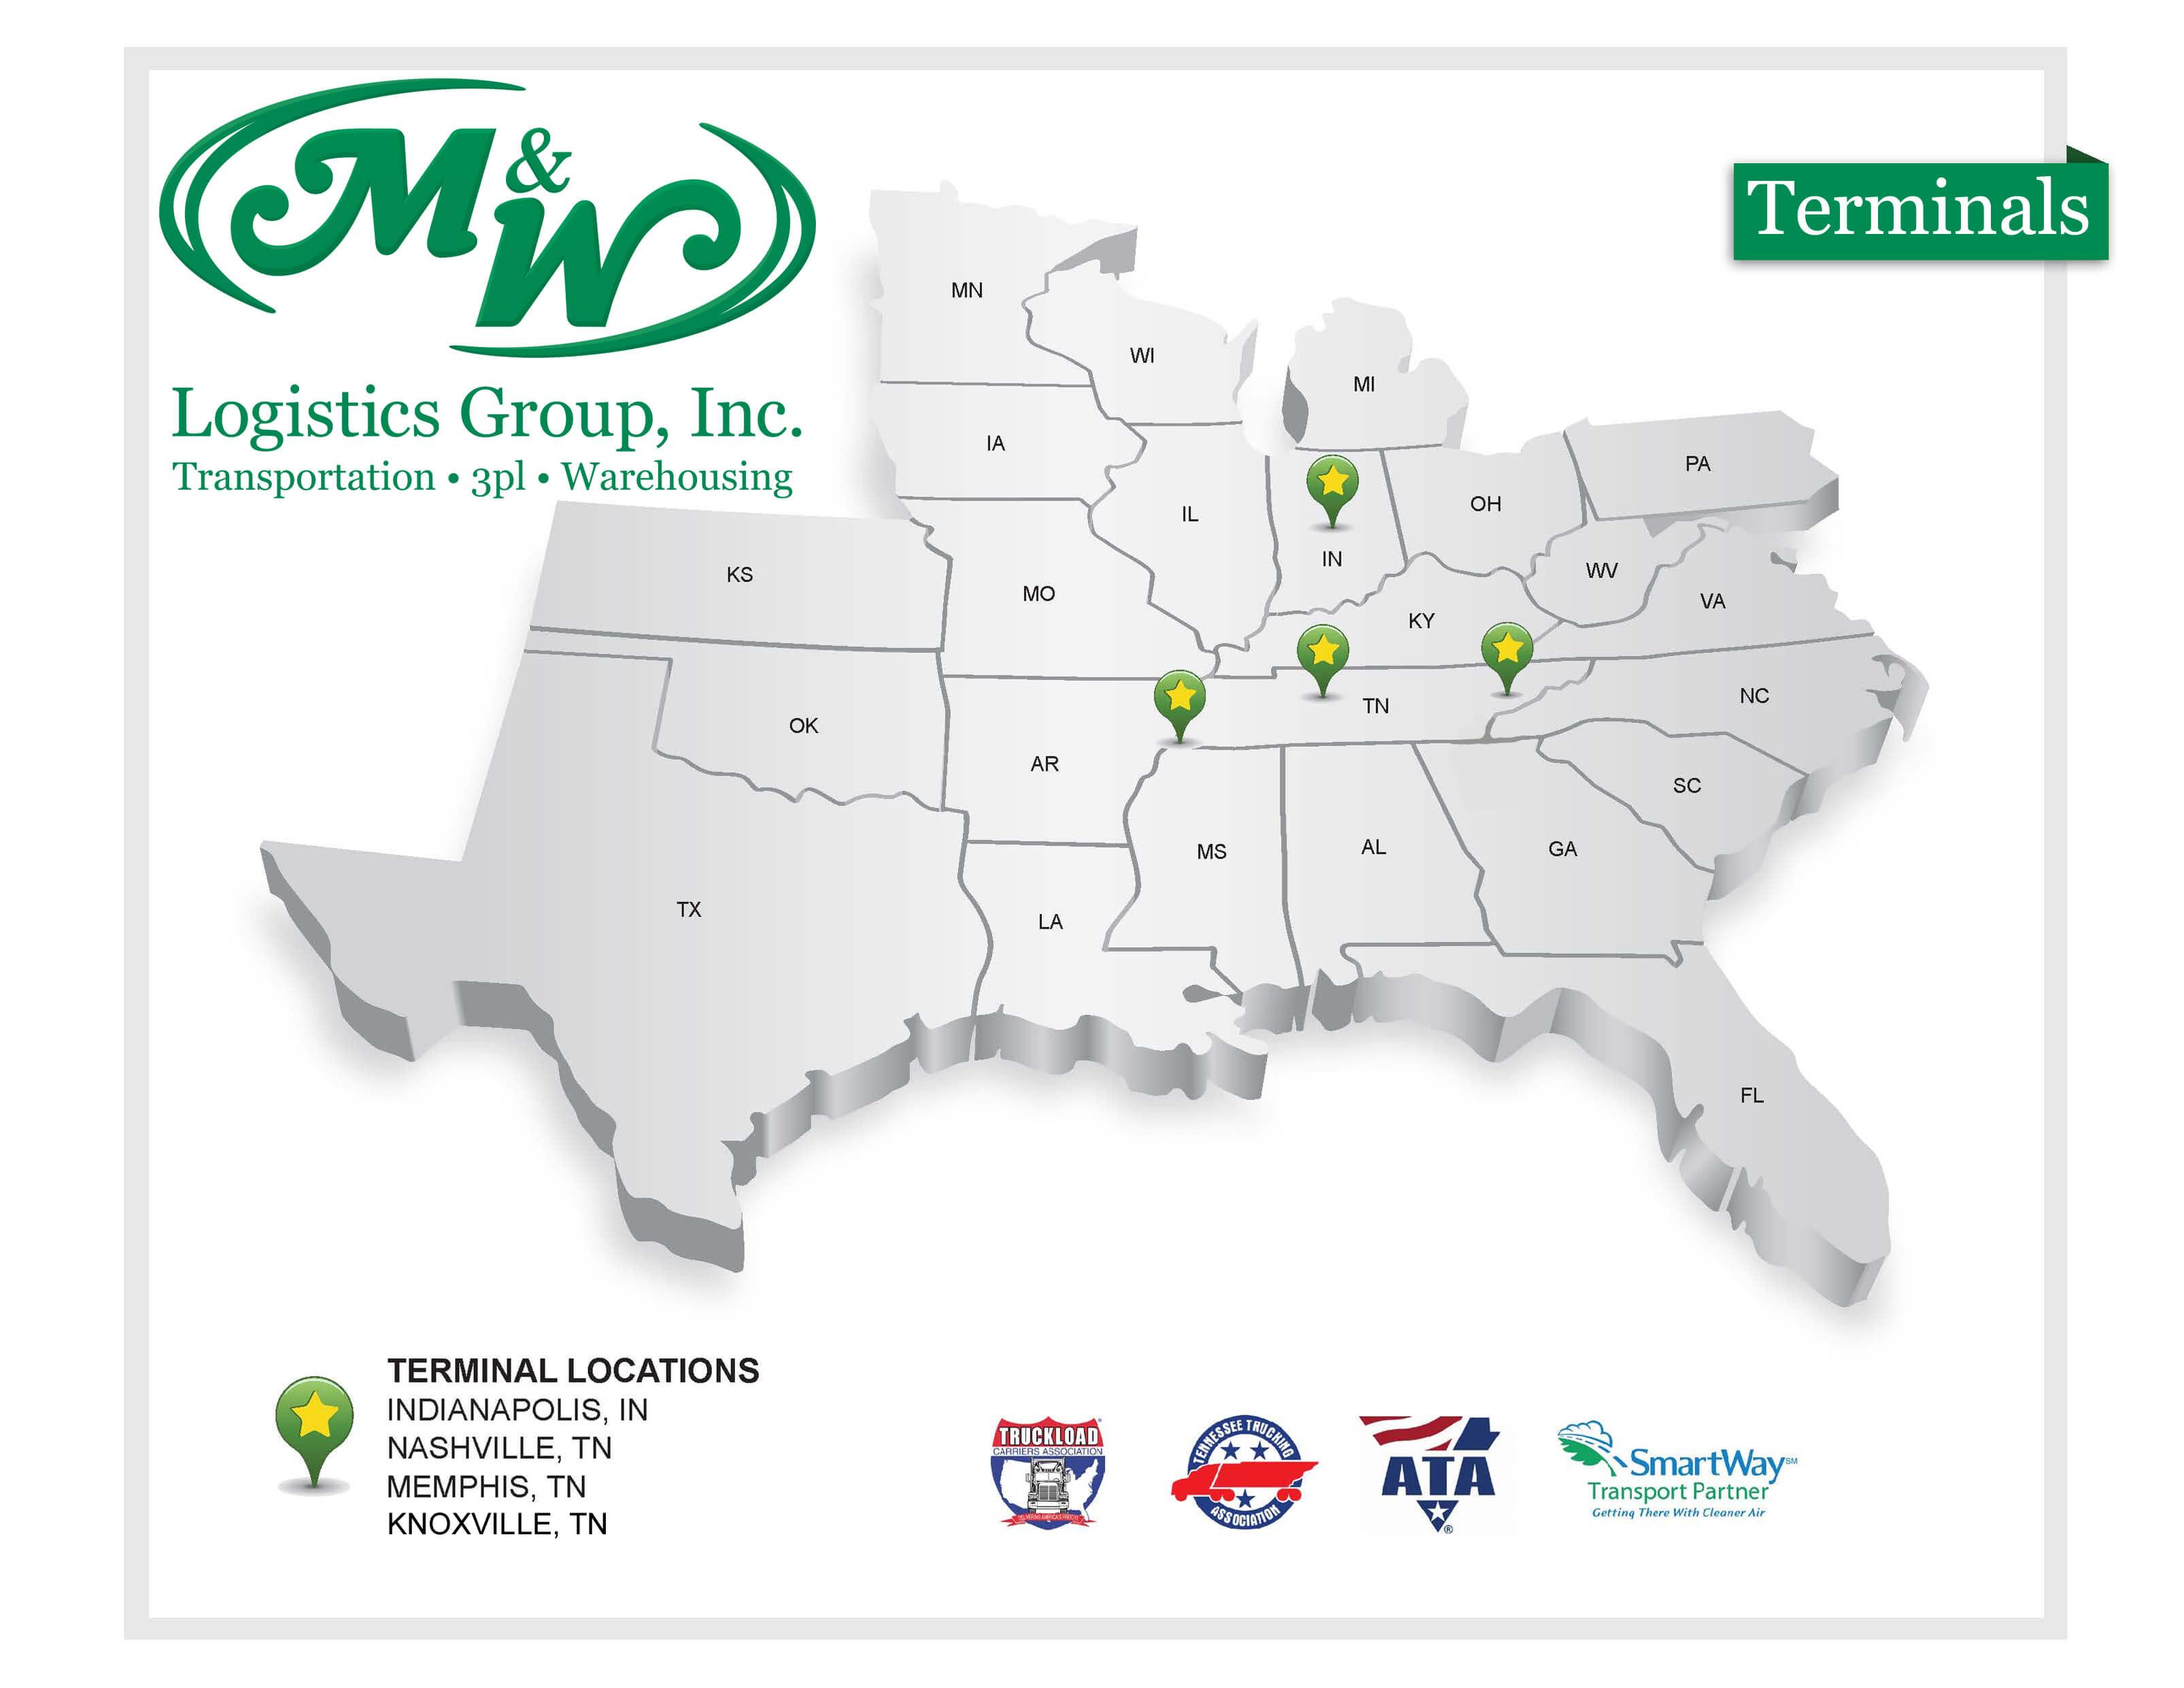 Service Map Terminals Edit Knoxville copy